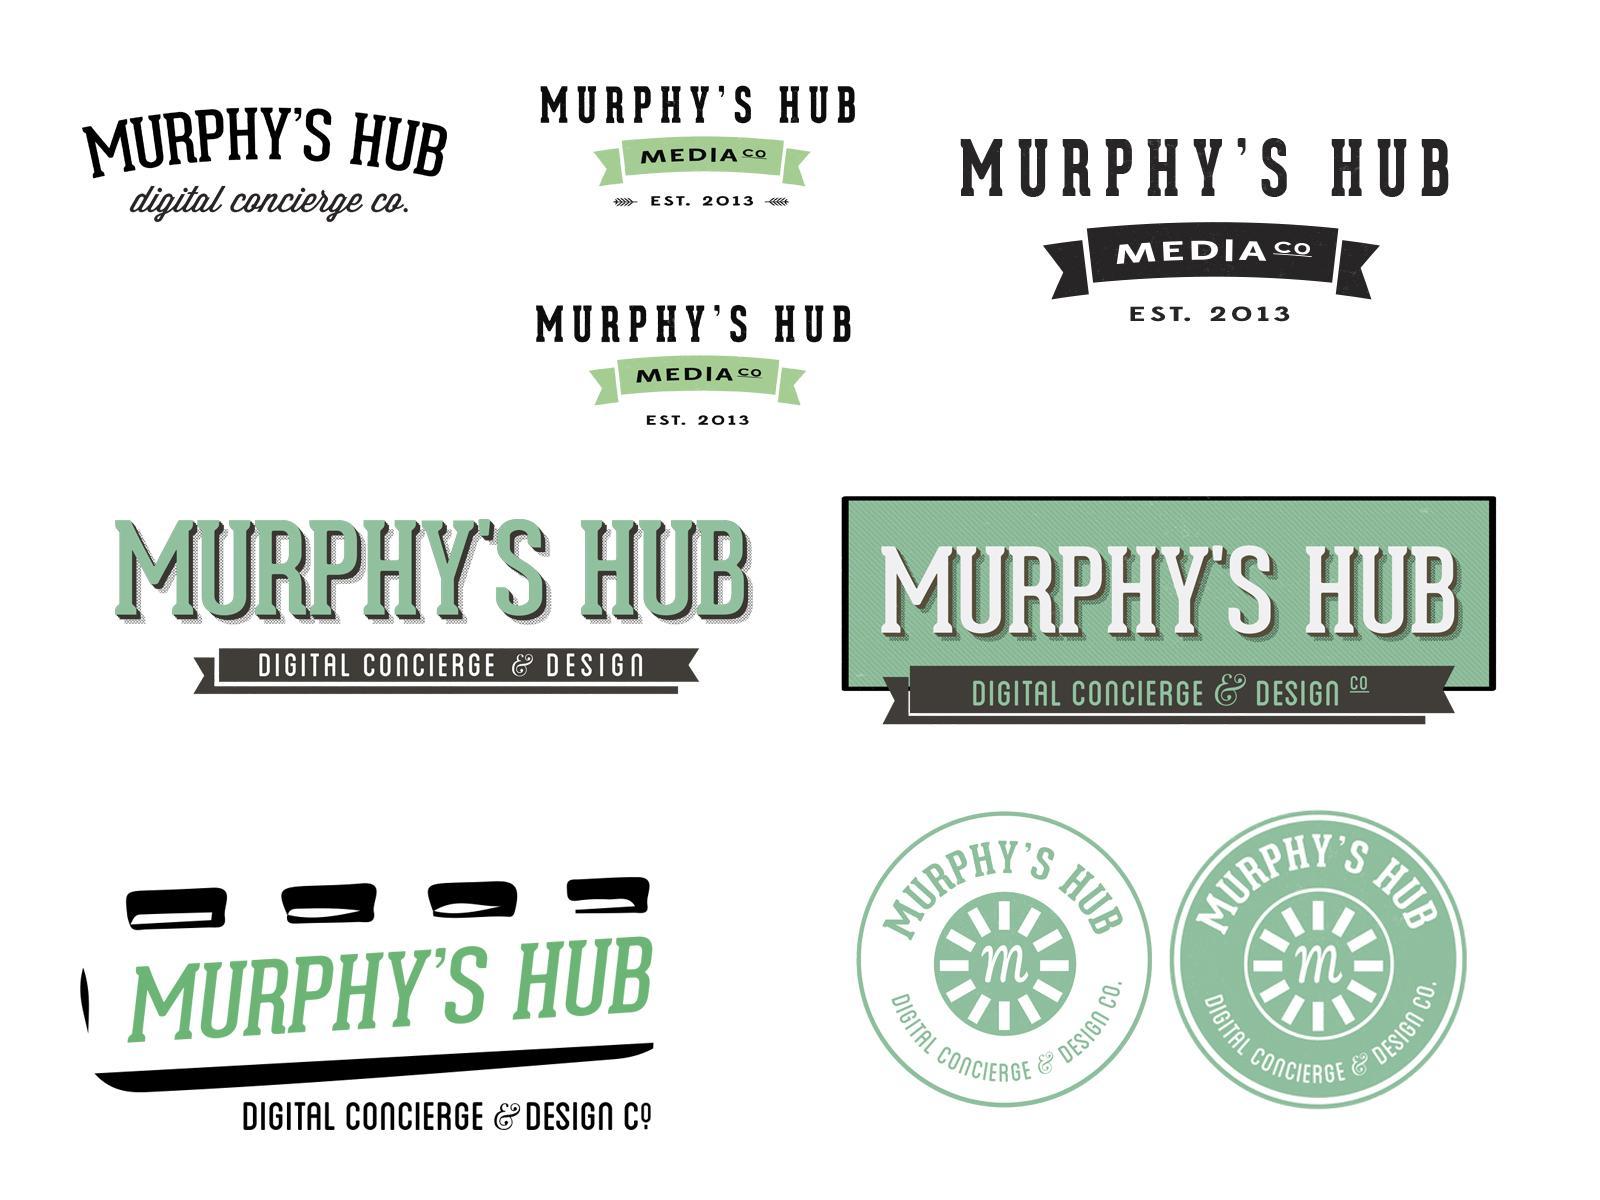 Murphy's Hub - image 3 - student project